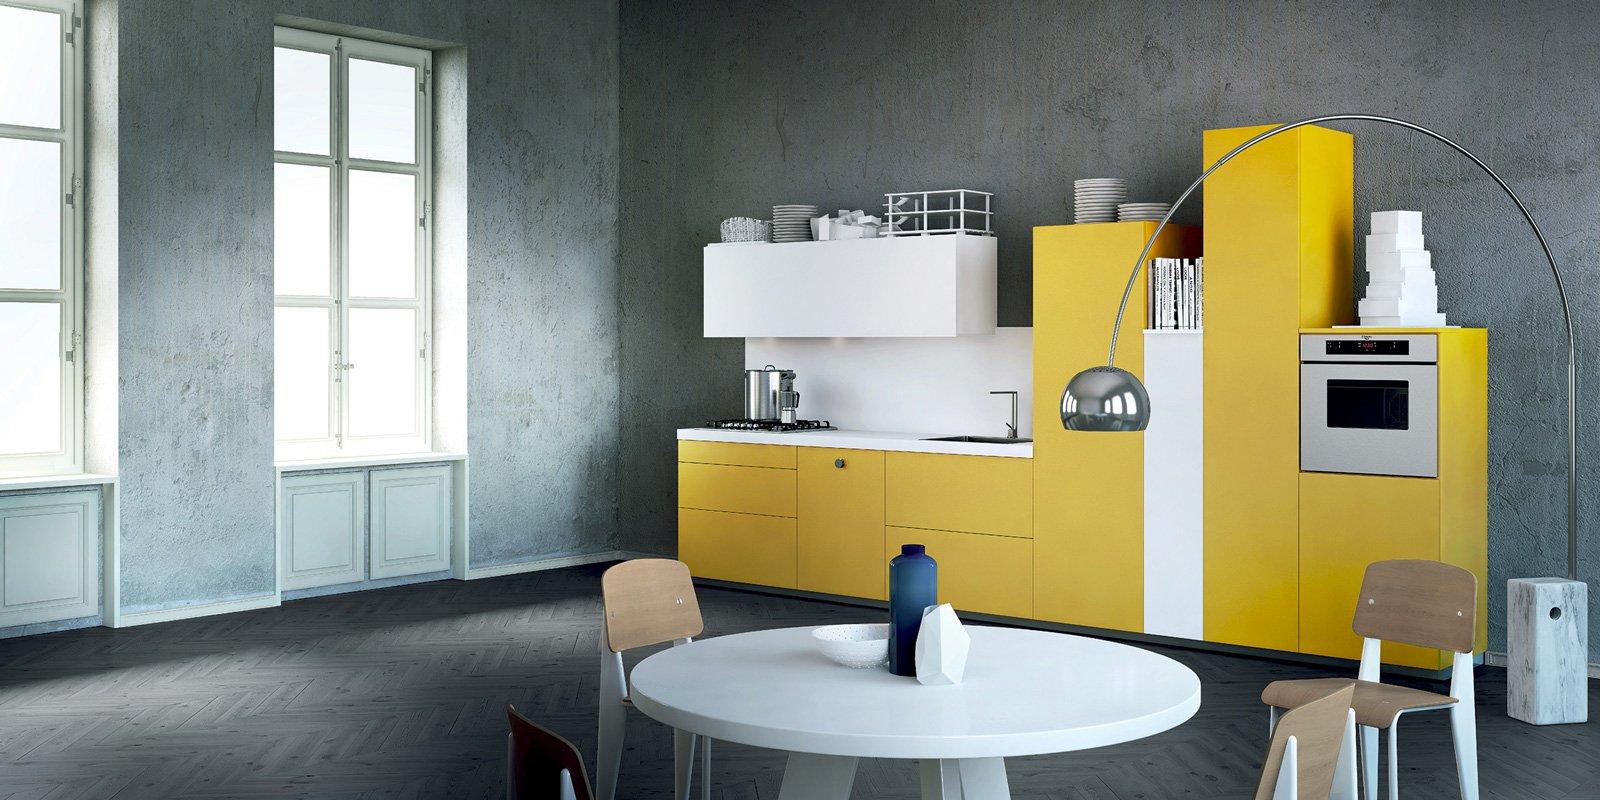 Cucine bicolore l 39 alternanza cromatica fa tendenza cose - Cucine moderne gialle ...